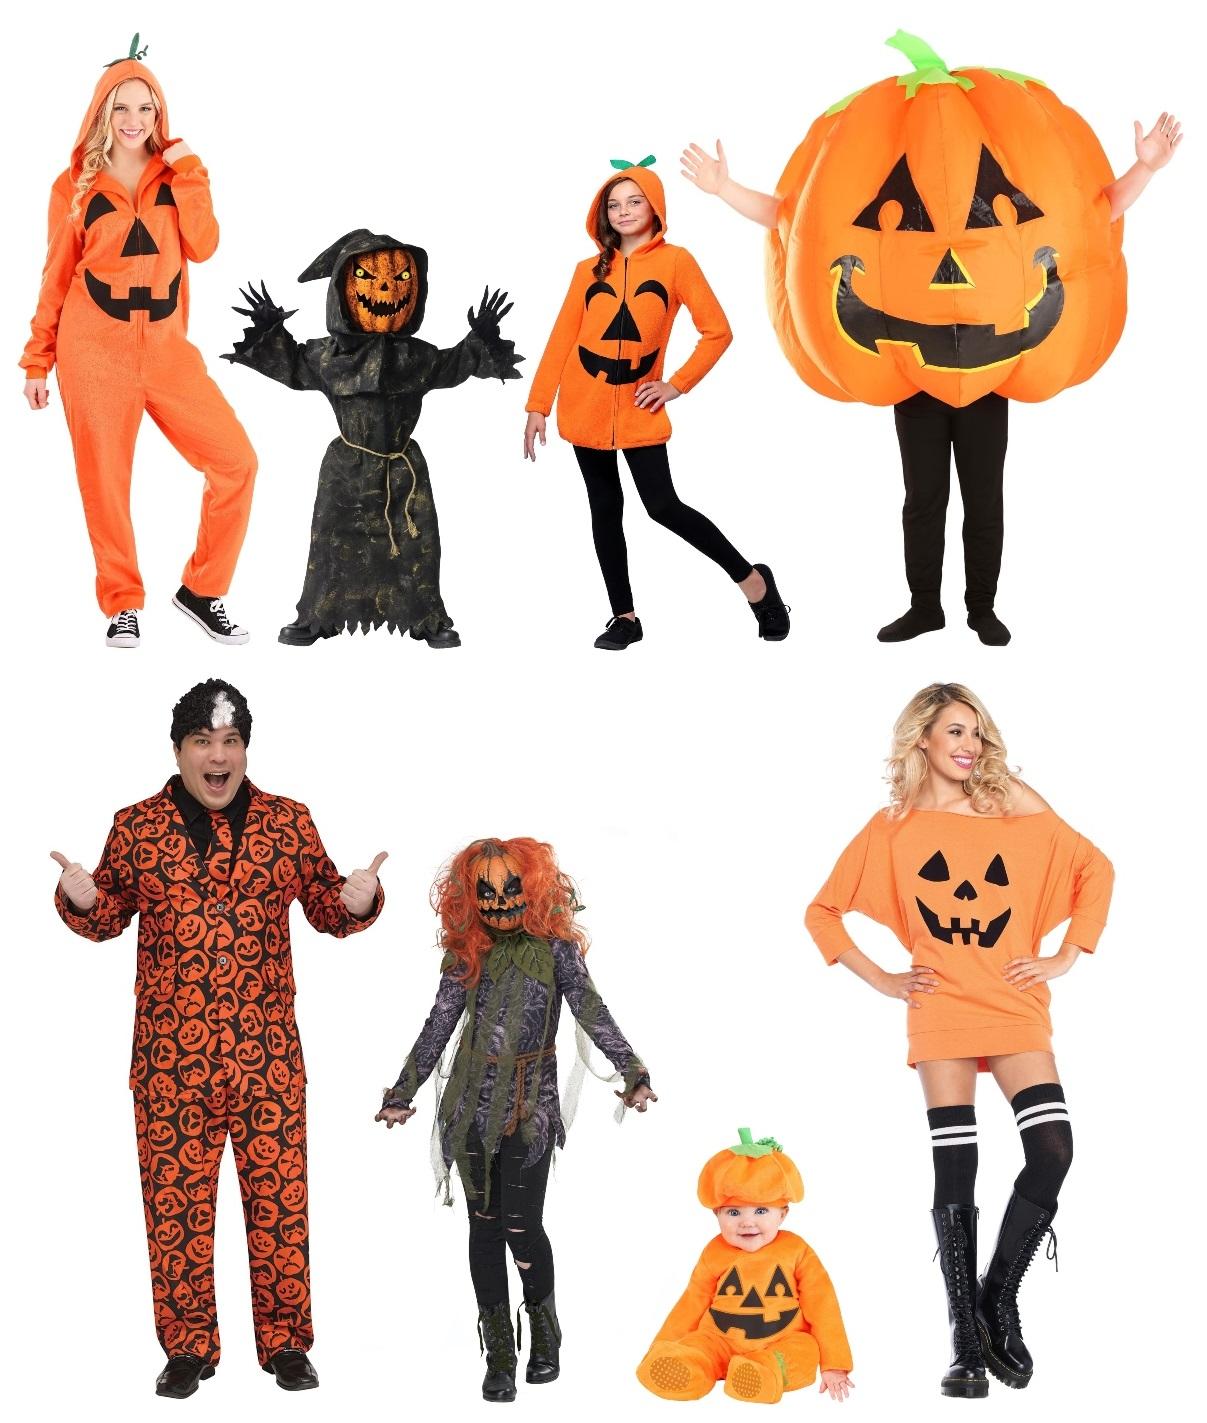 Pumpkin Costume Ideas